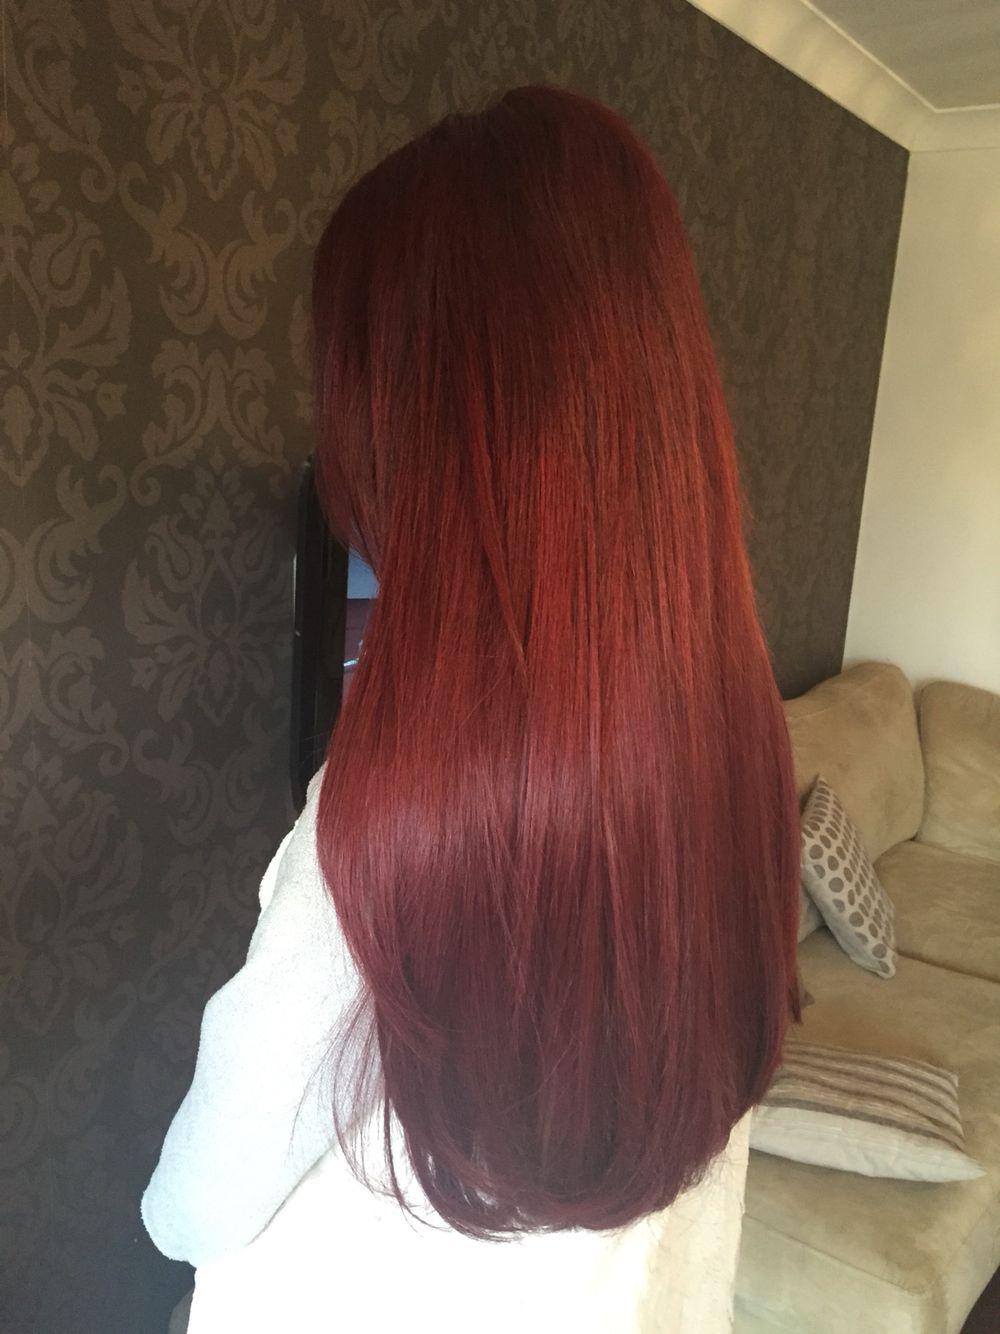 A full head of bright red micro bond hair extensions a full head of bright red micro bond hair extensions pmusecretfo Gallery